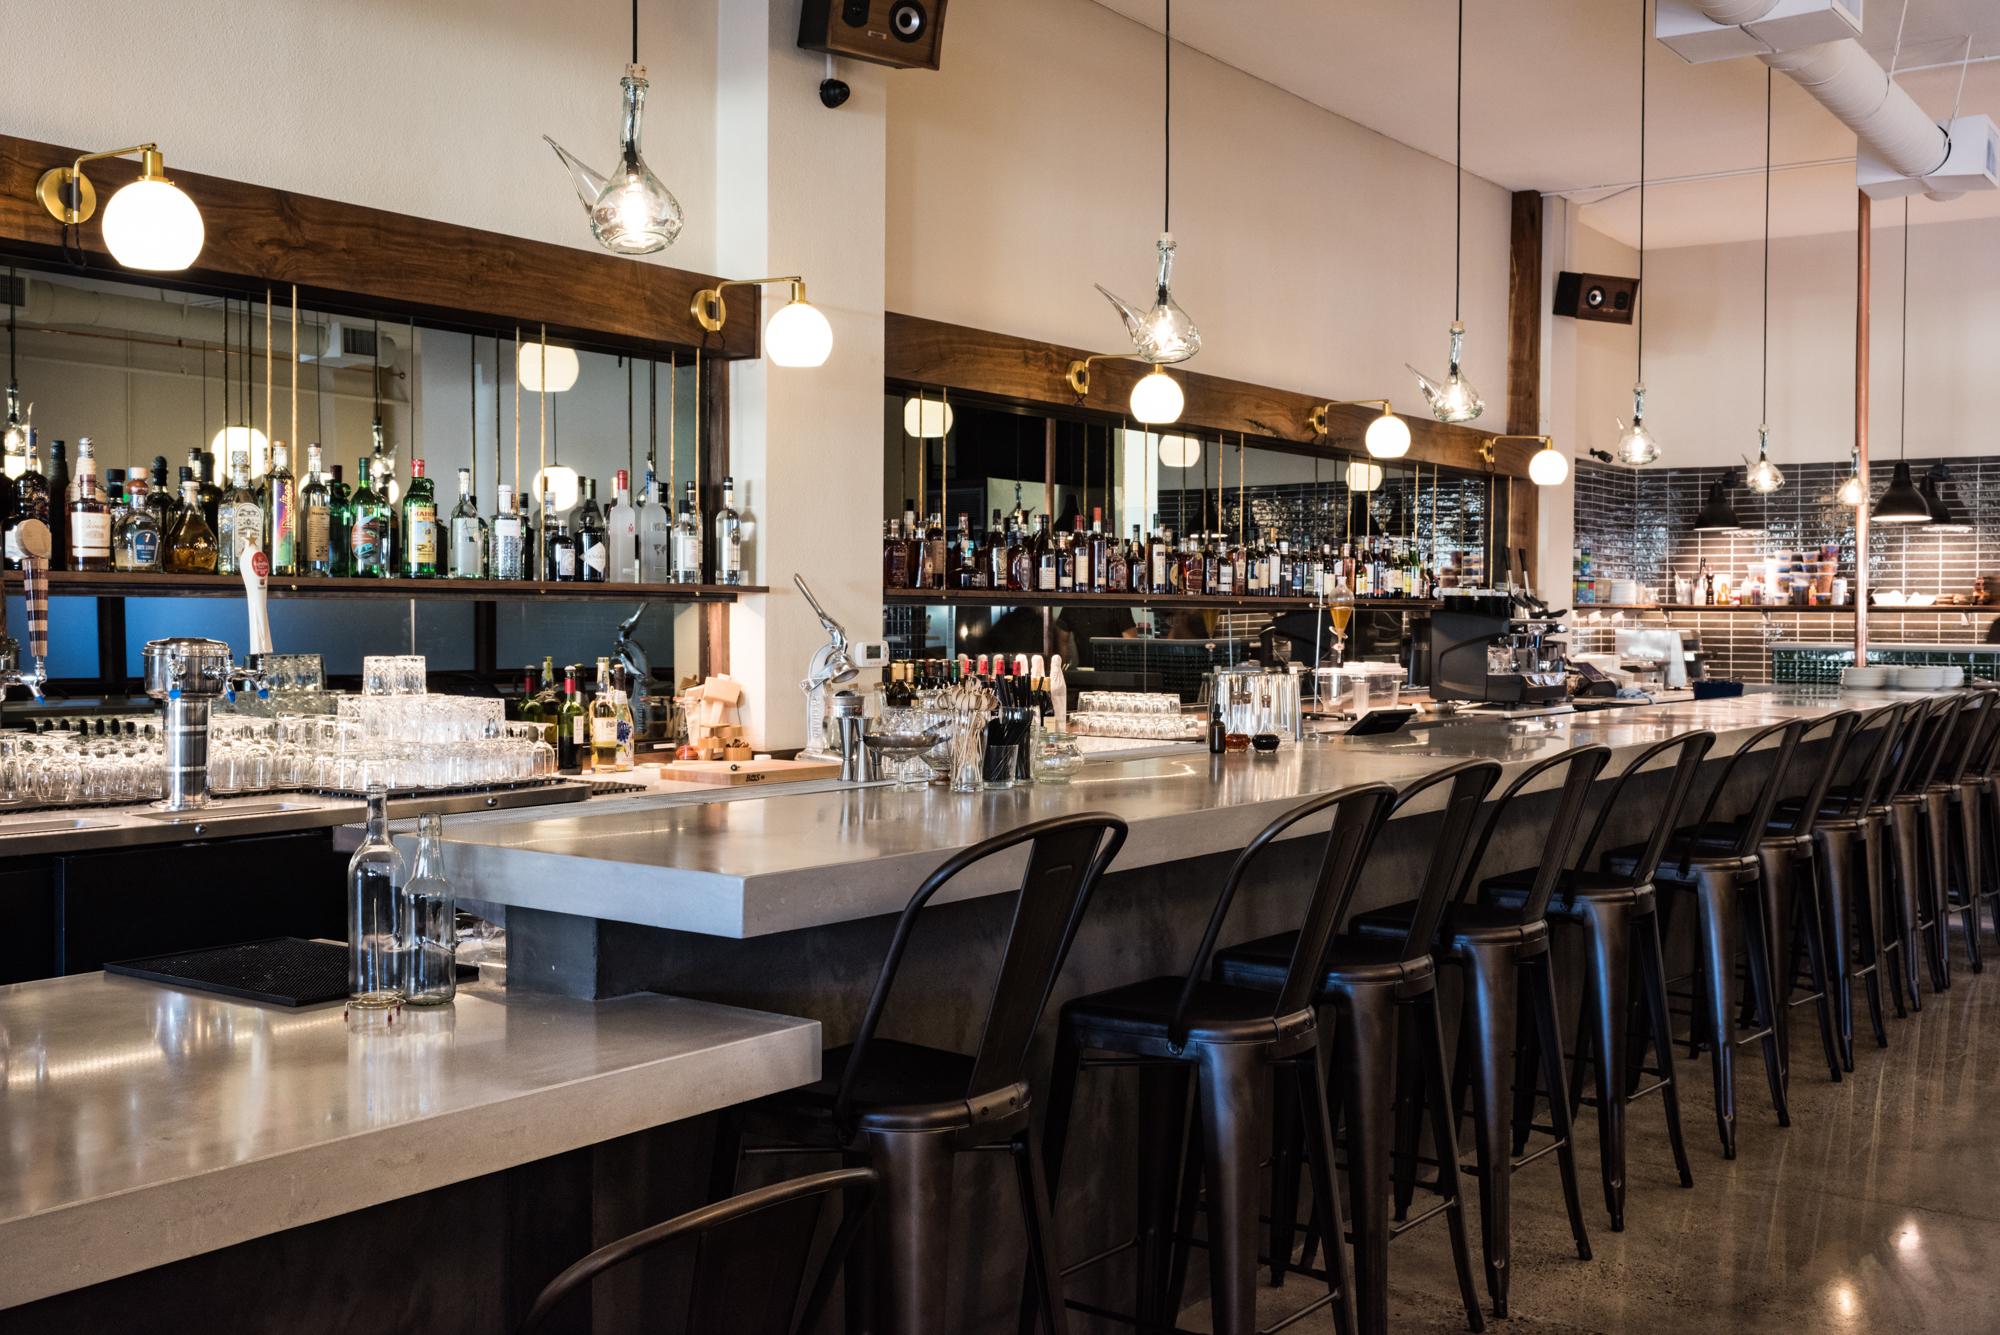 The bar area at Chesa